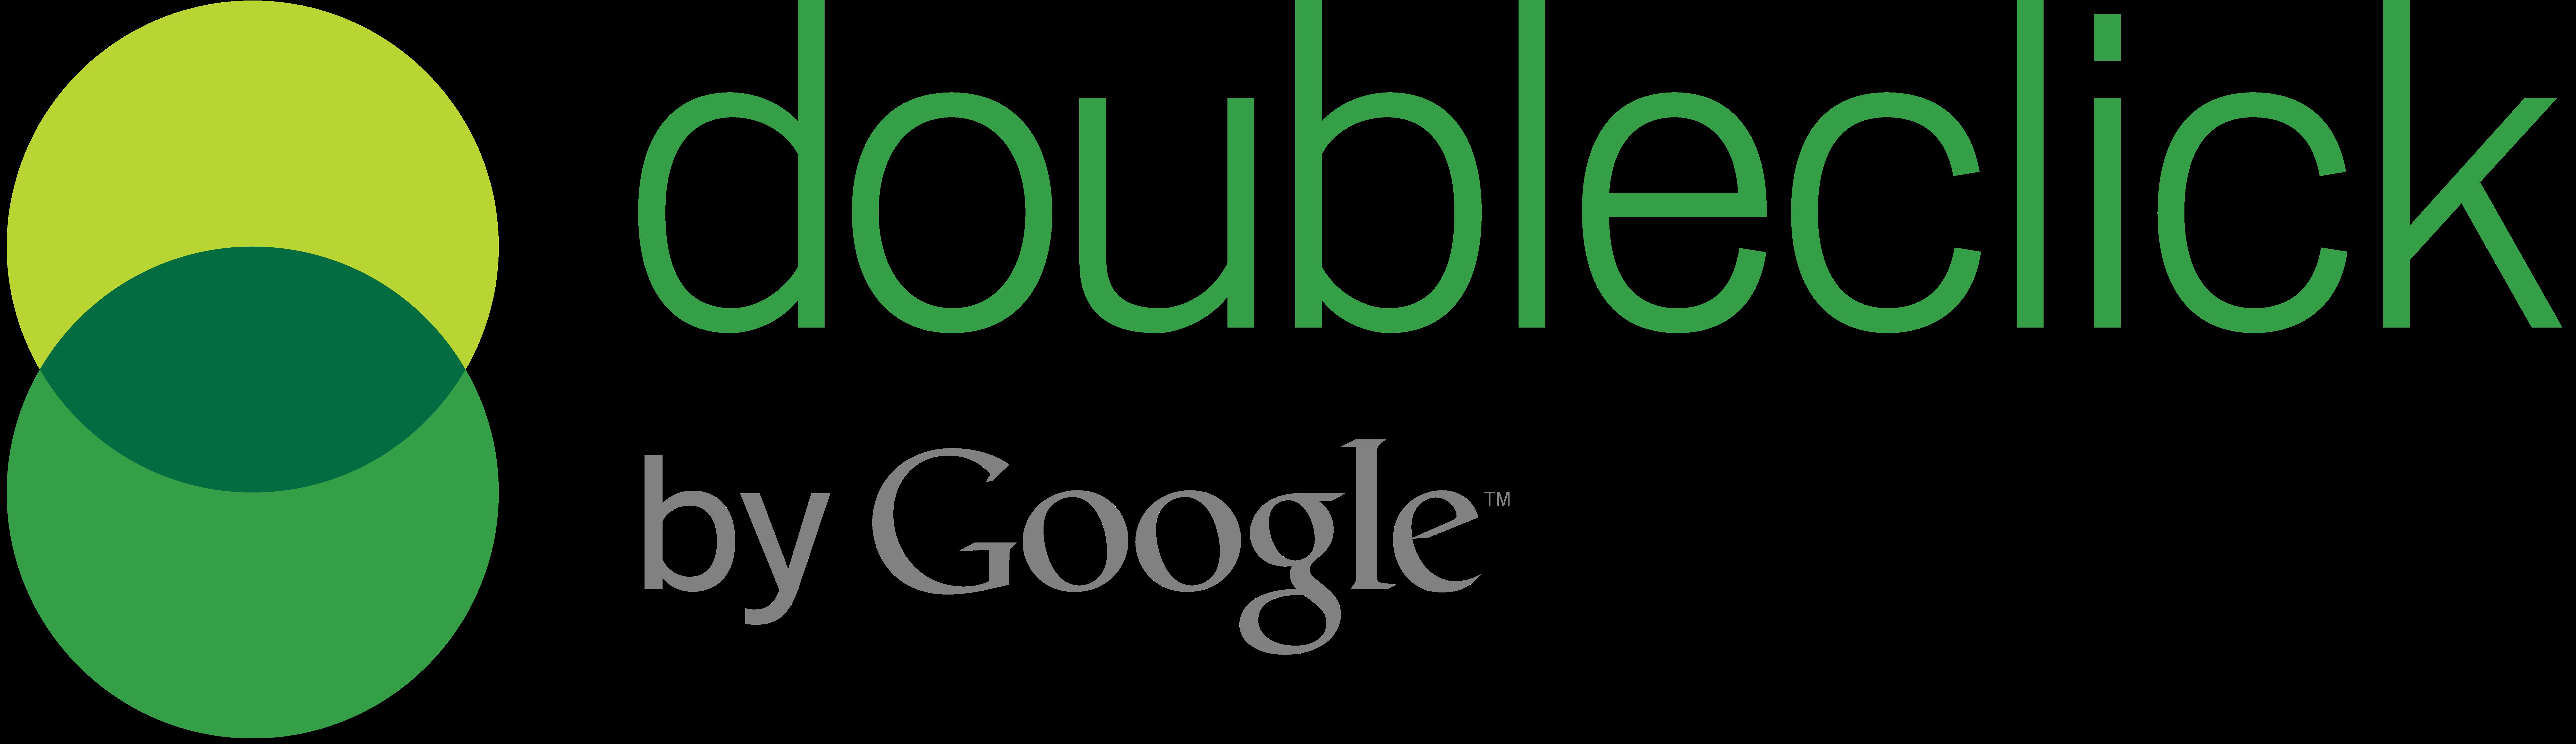 Doubleclick by Google Logo